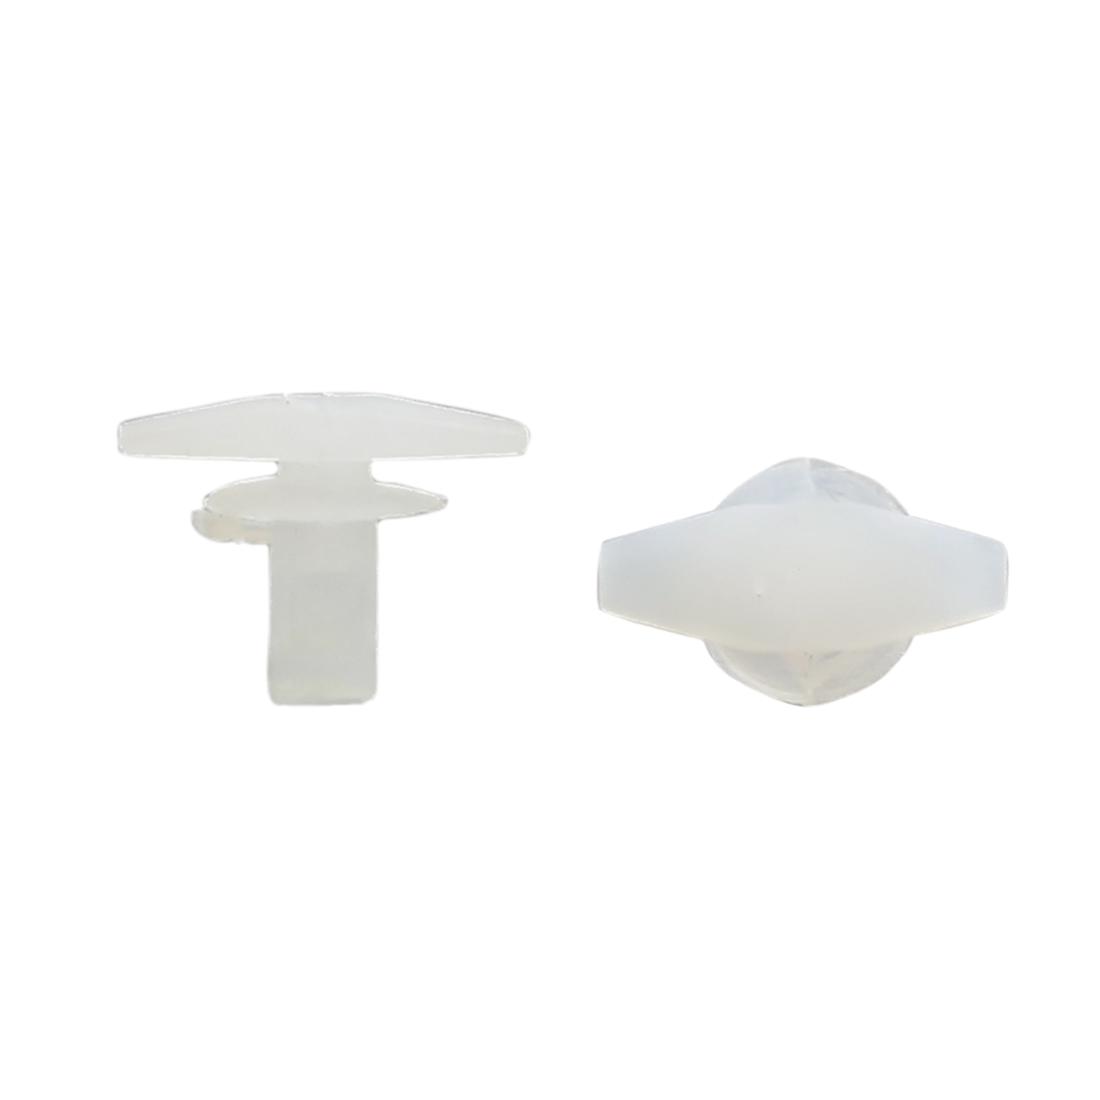 100 Pcs 5mm Hole Plastic Rivet Fastener Mud Flaps Bumper Fender Push Clips White